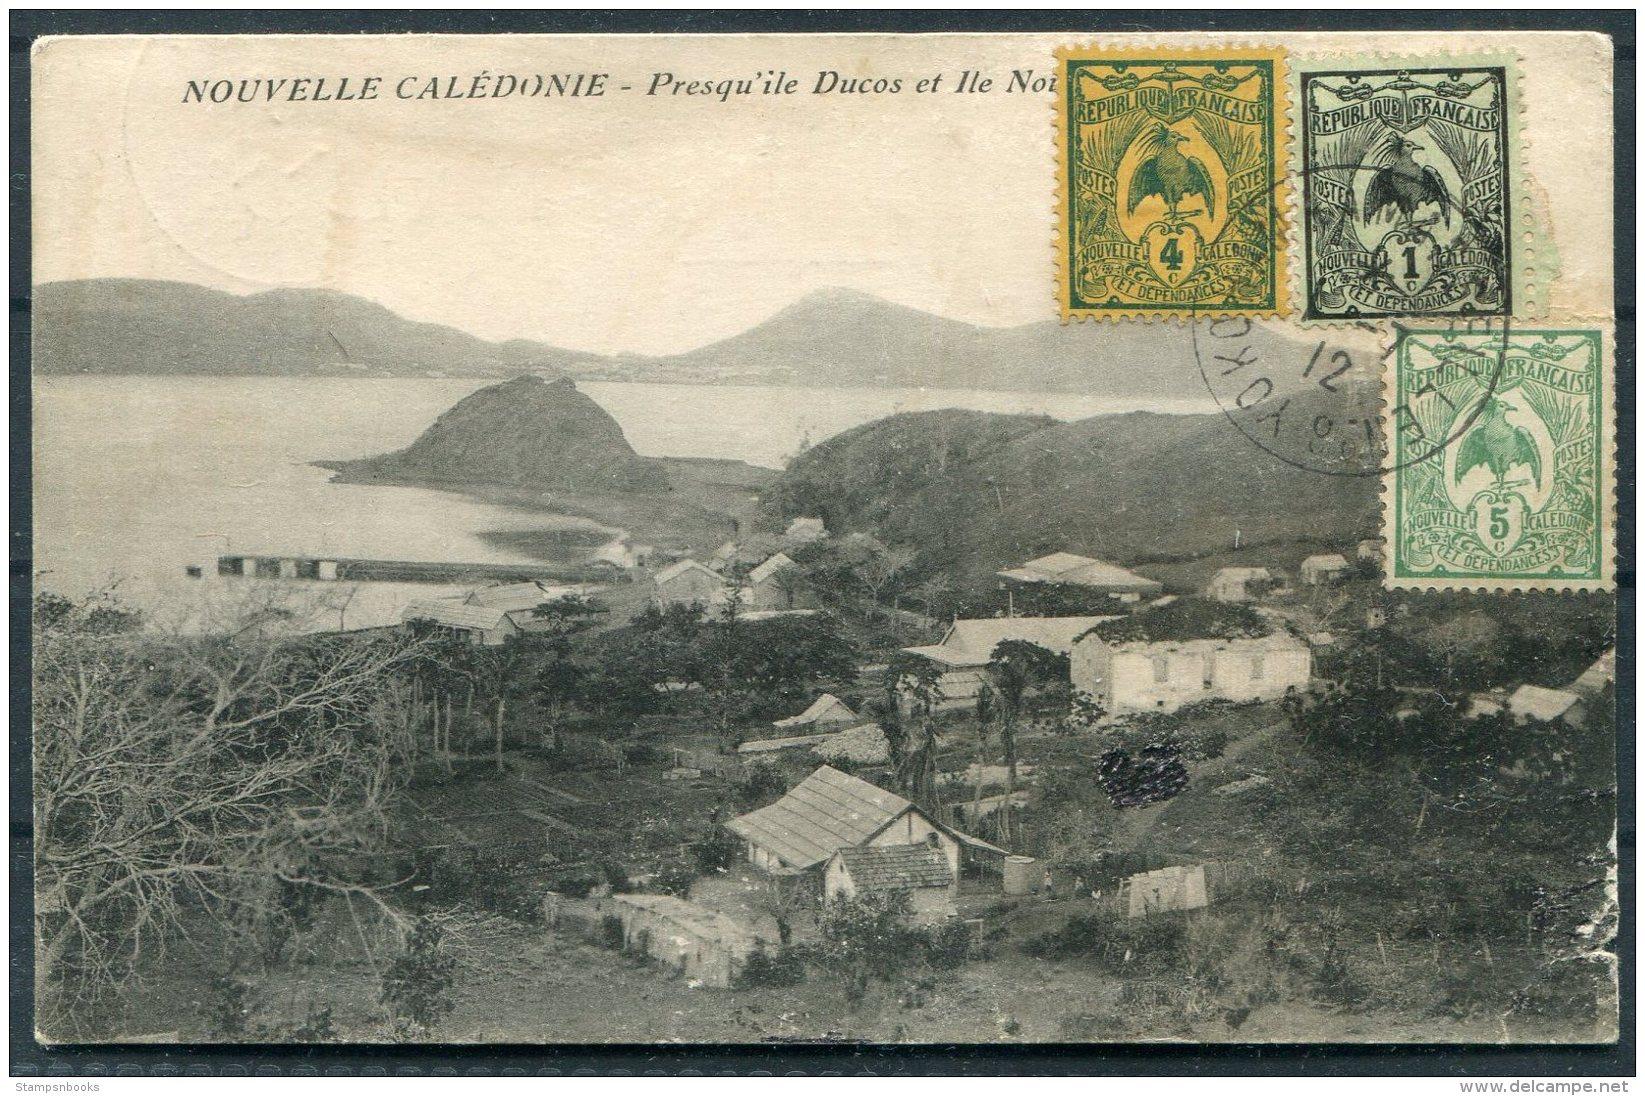 1912 New Caledonia Postcard, Yokohama Maseille Paquebot - Paris. Ship NERA - Neukaledonien